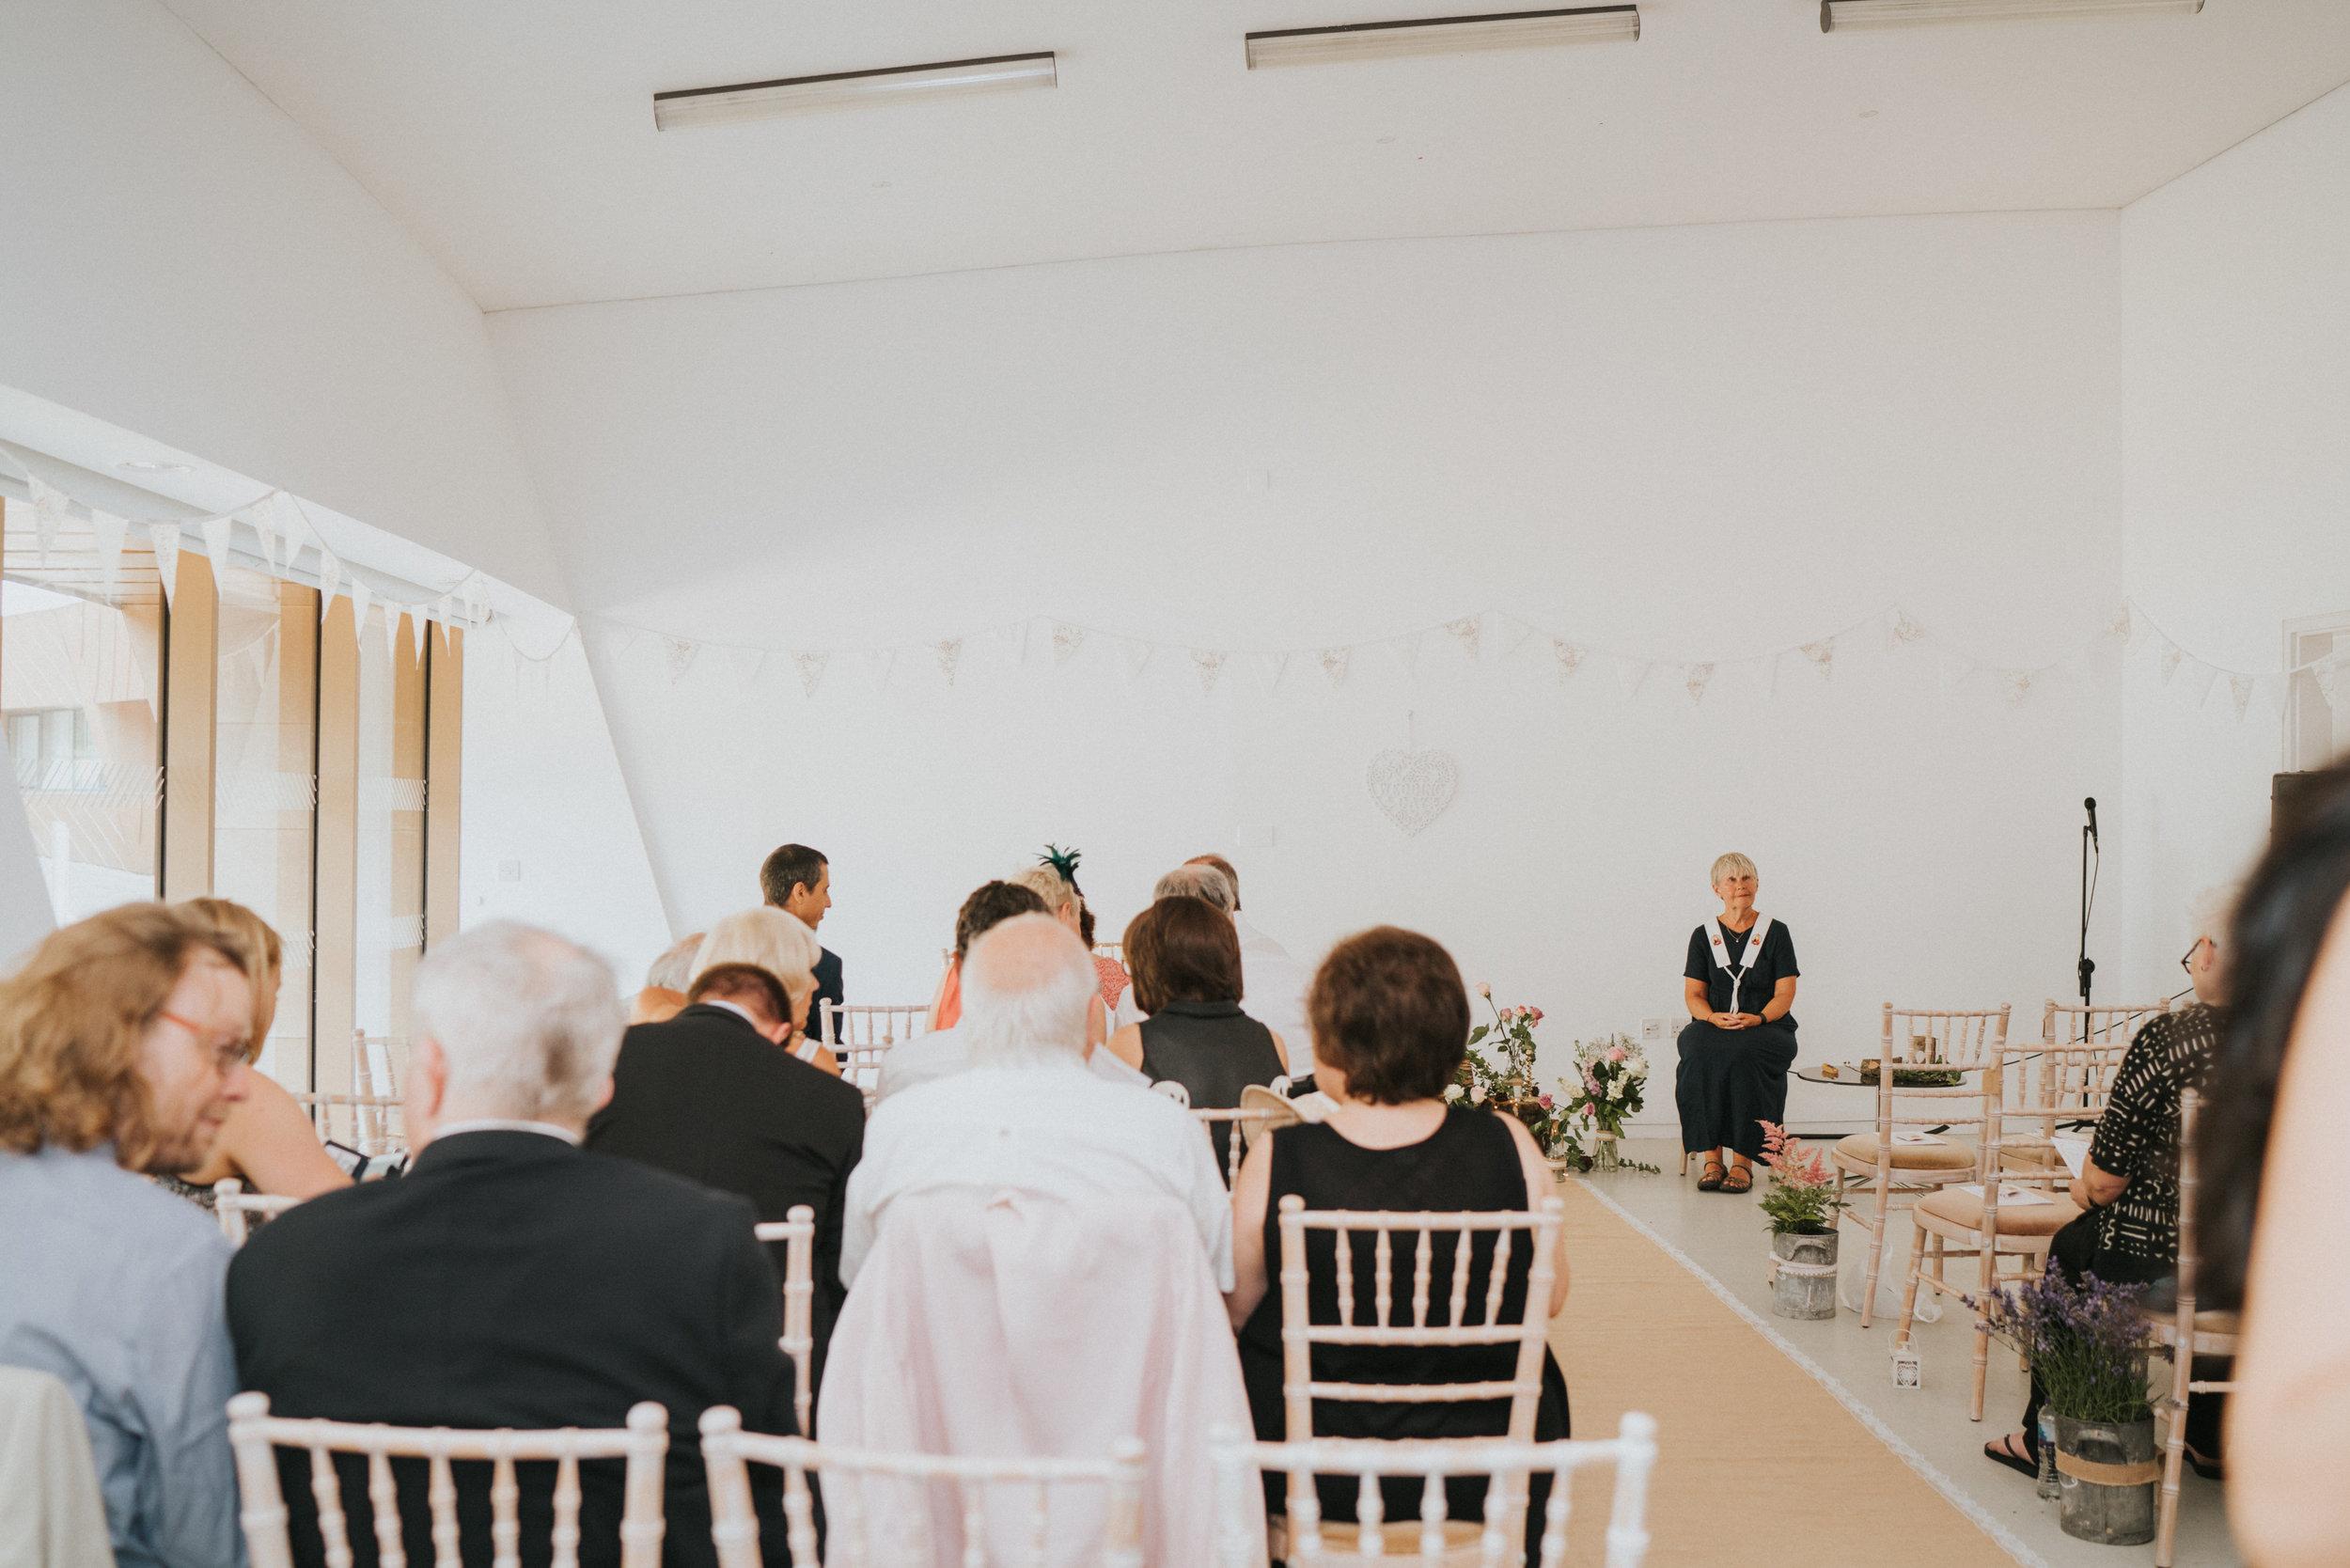 Grace-Elizabeth-Georgie-Amalaketu-Firstsite-Colchester-Essex-Boho-Buddhist-Wedding-Alternative-Wedding-Photography-Essex (34 of 100).jpg